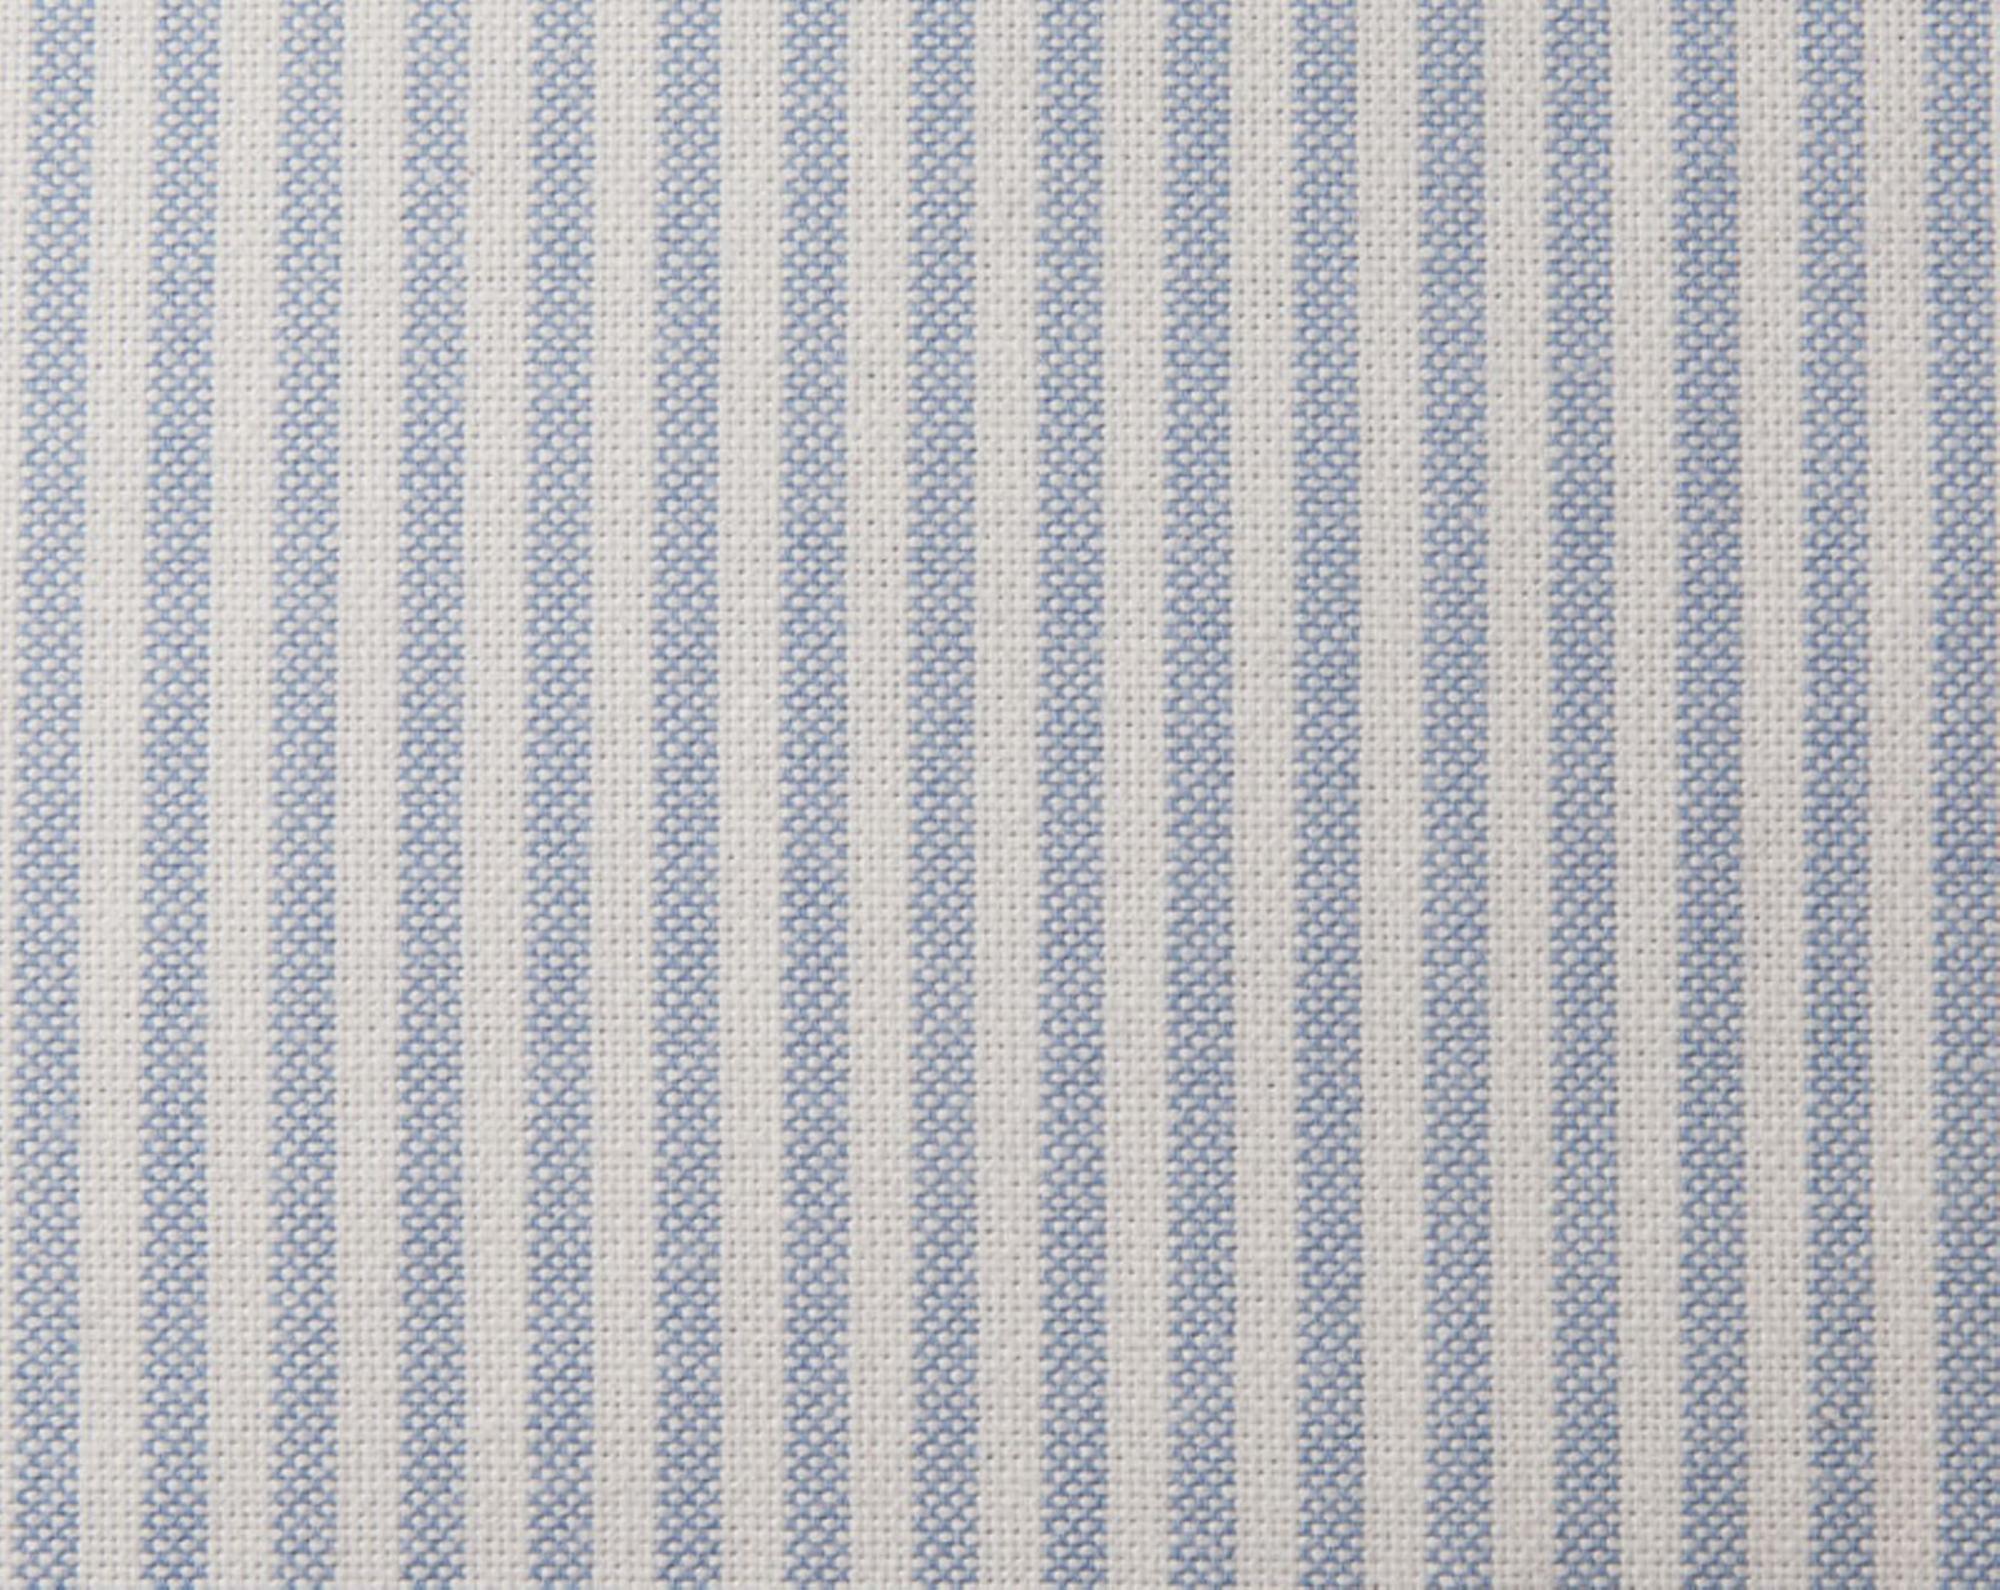 Pin Point Blue/White Flat Sheet